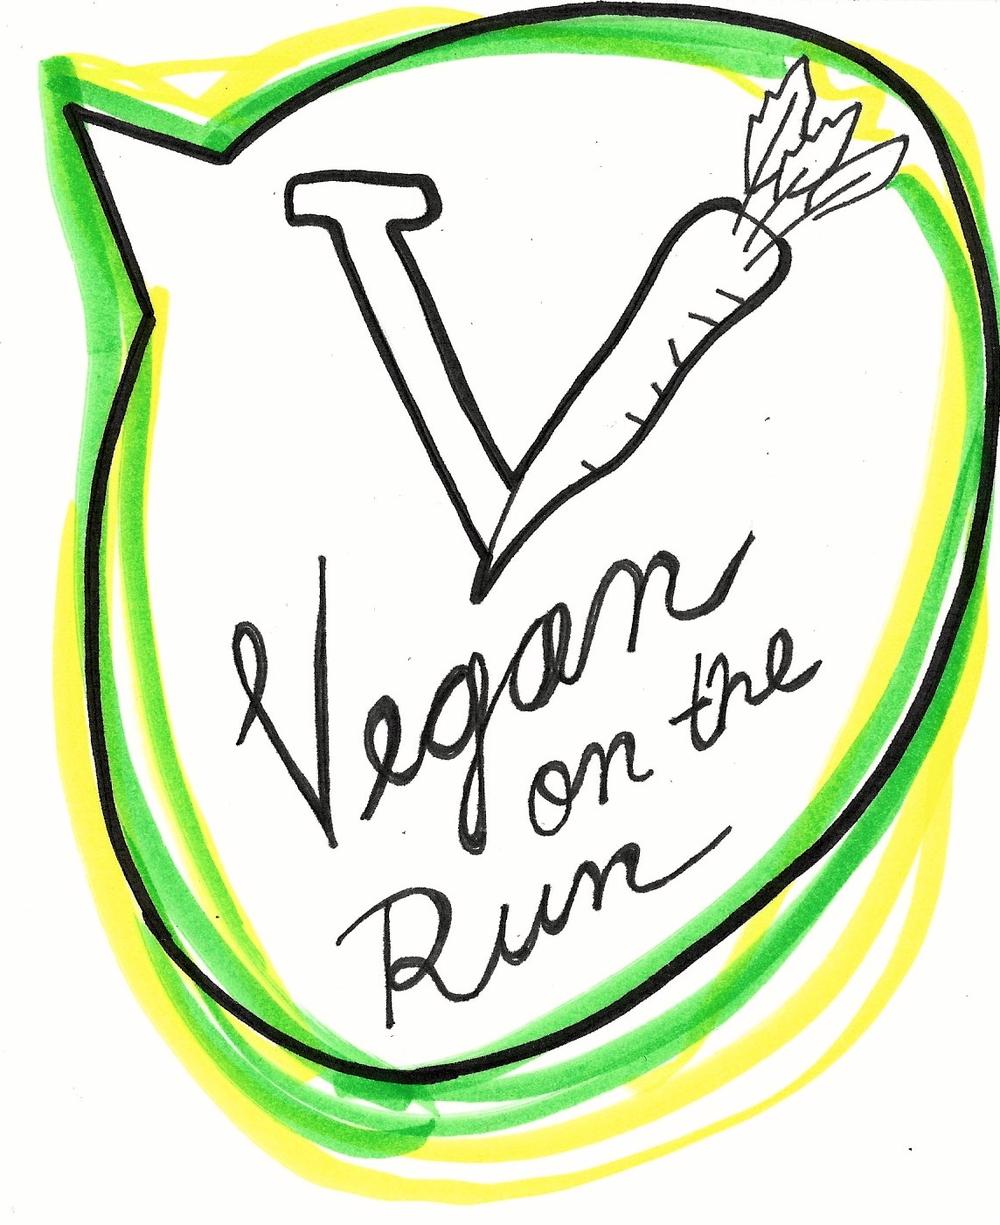 veganontherun.org